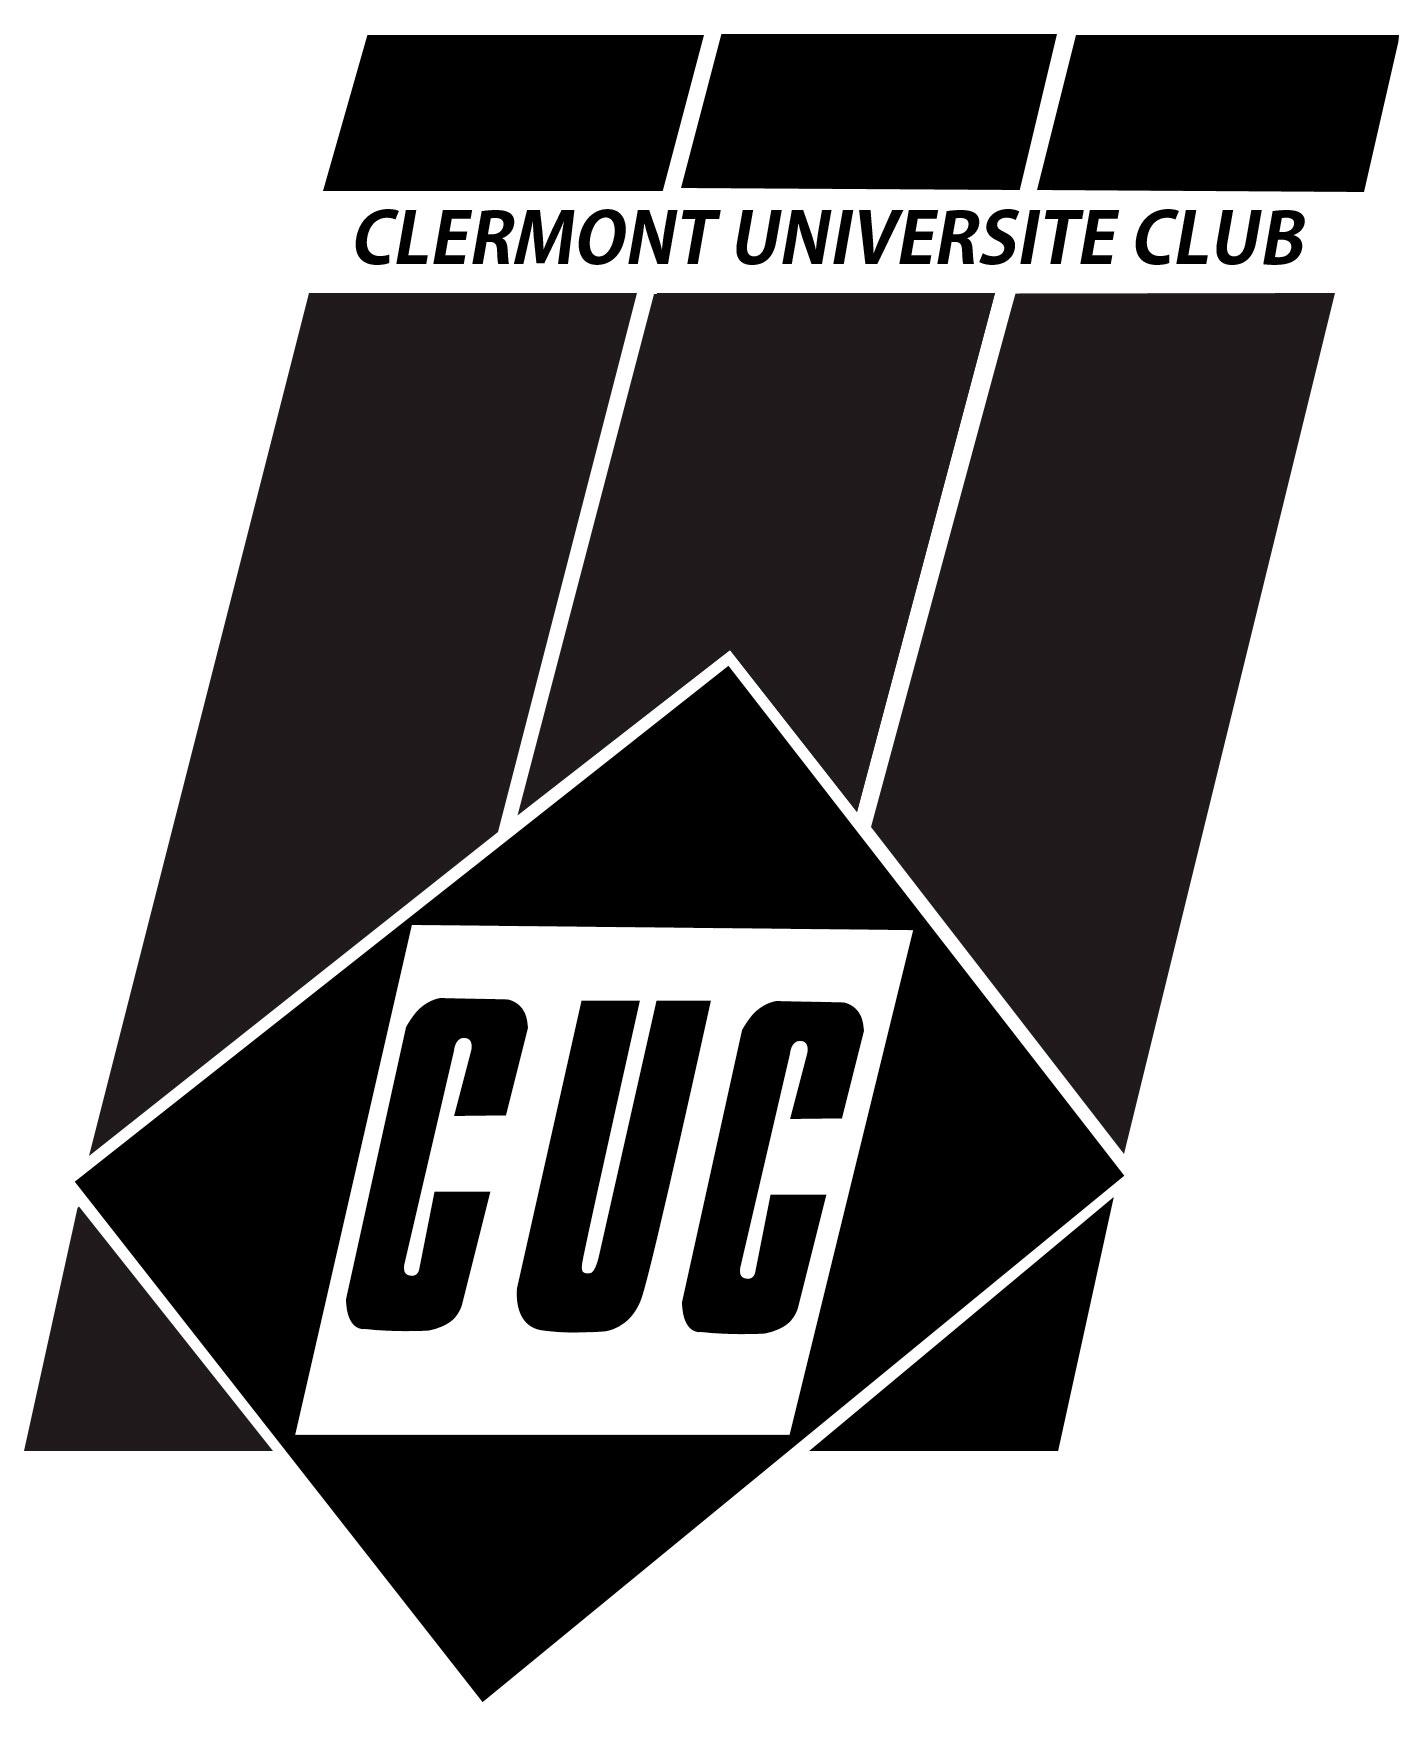 CUC - CLERMONT UNIVERSITE CLUB